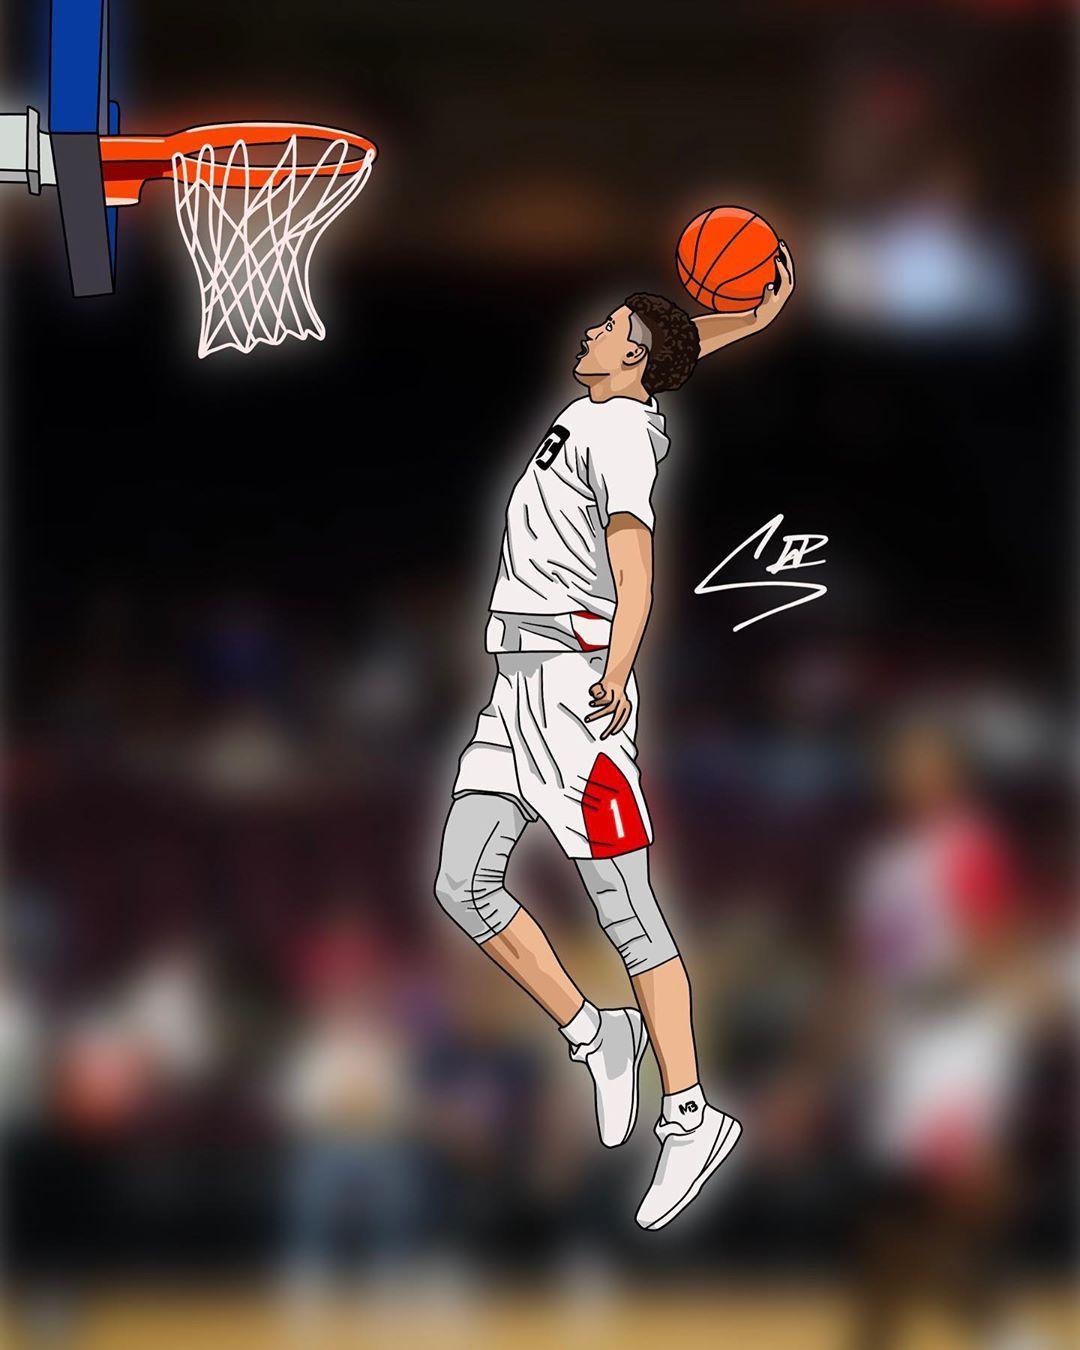 Follow for cartoon on instagram art of lamelo ball